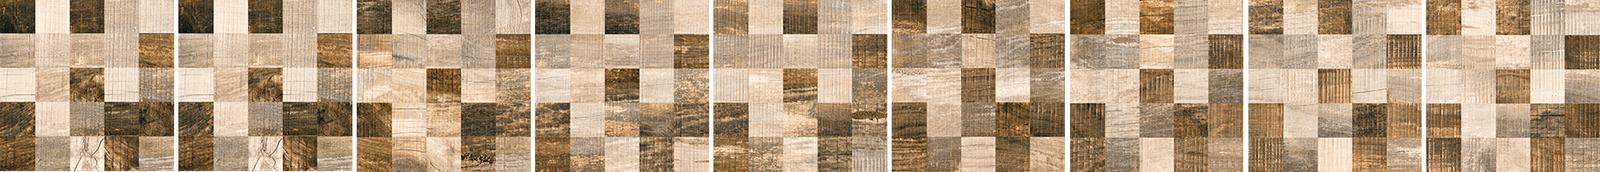 Универсальная плитка Azulindus & Marti Sabina Dados Mix 25x25 (0,9375) peter marti baustatik grundlagen stabtragwerke flächentragwerk